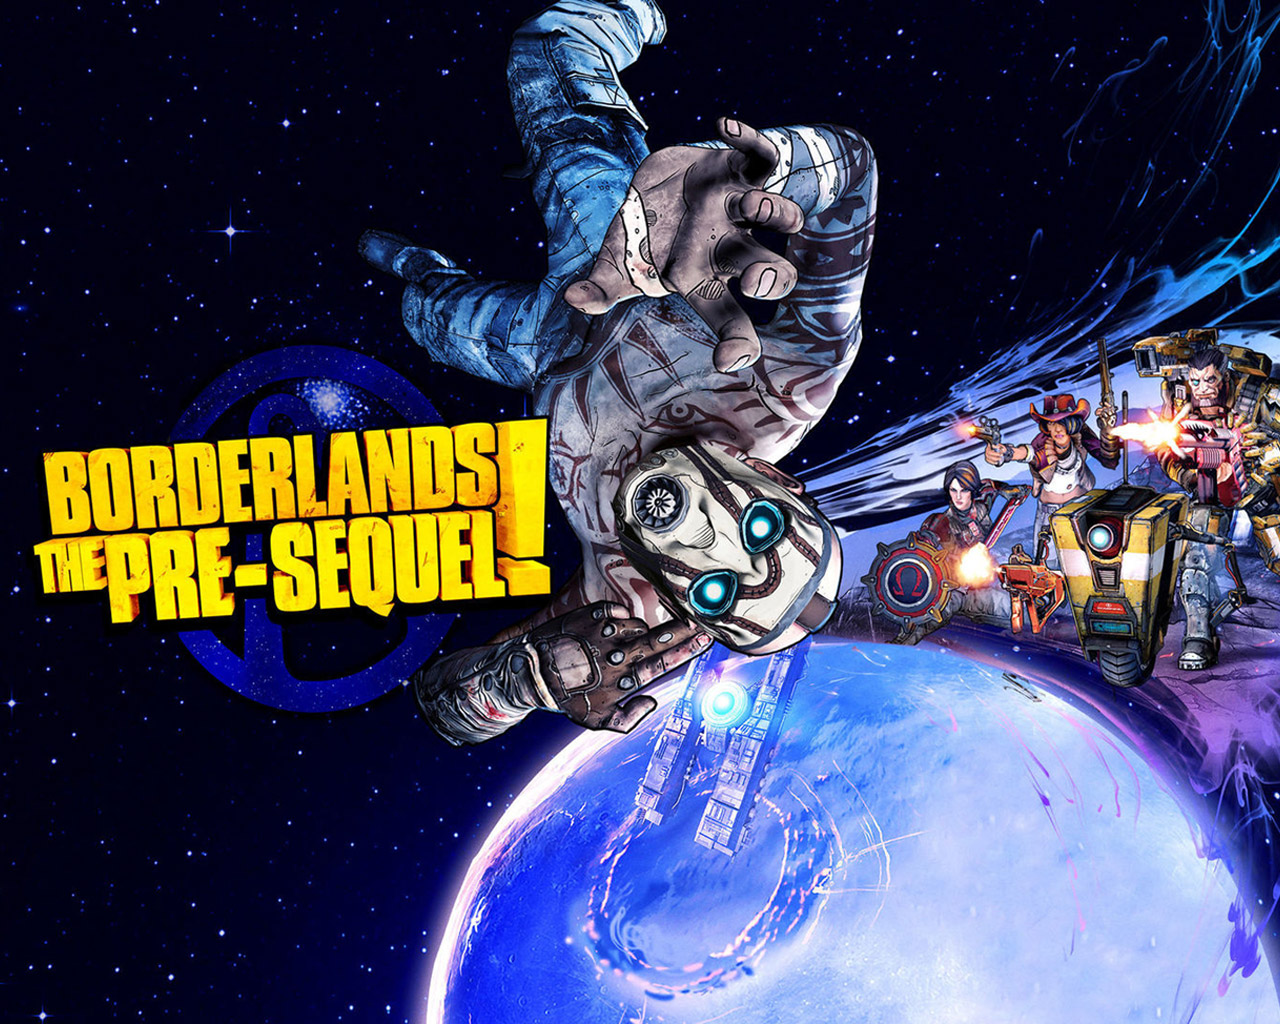 Borderlands: The Pre-Sequel Wallpaper in 1280x1024